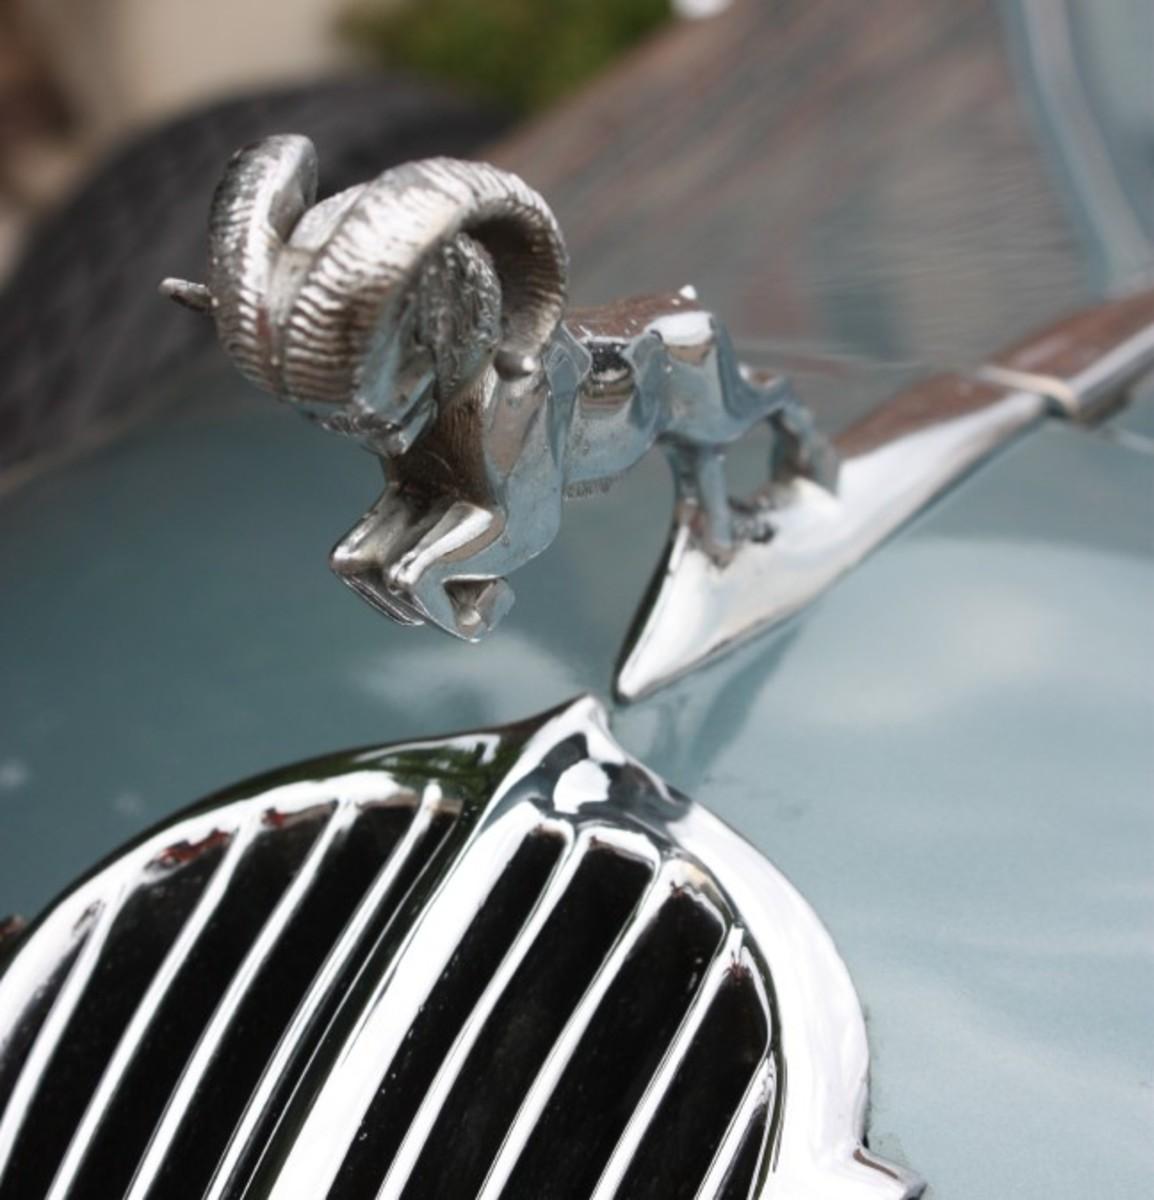 1936 Dodge ornament